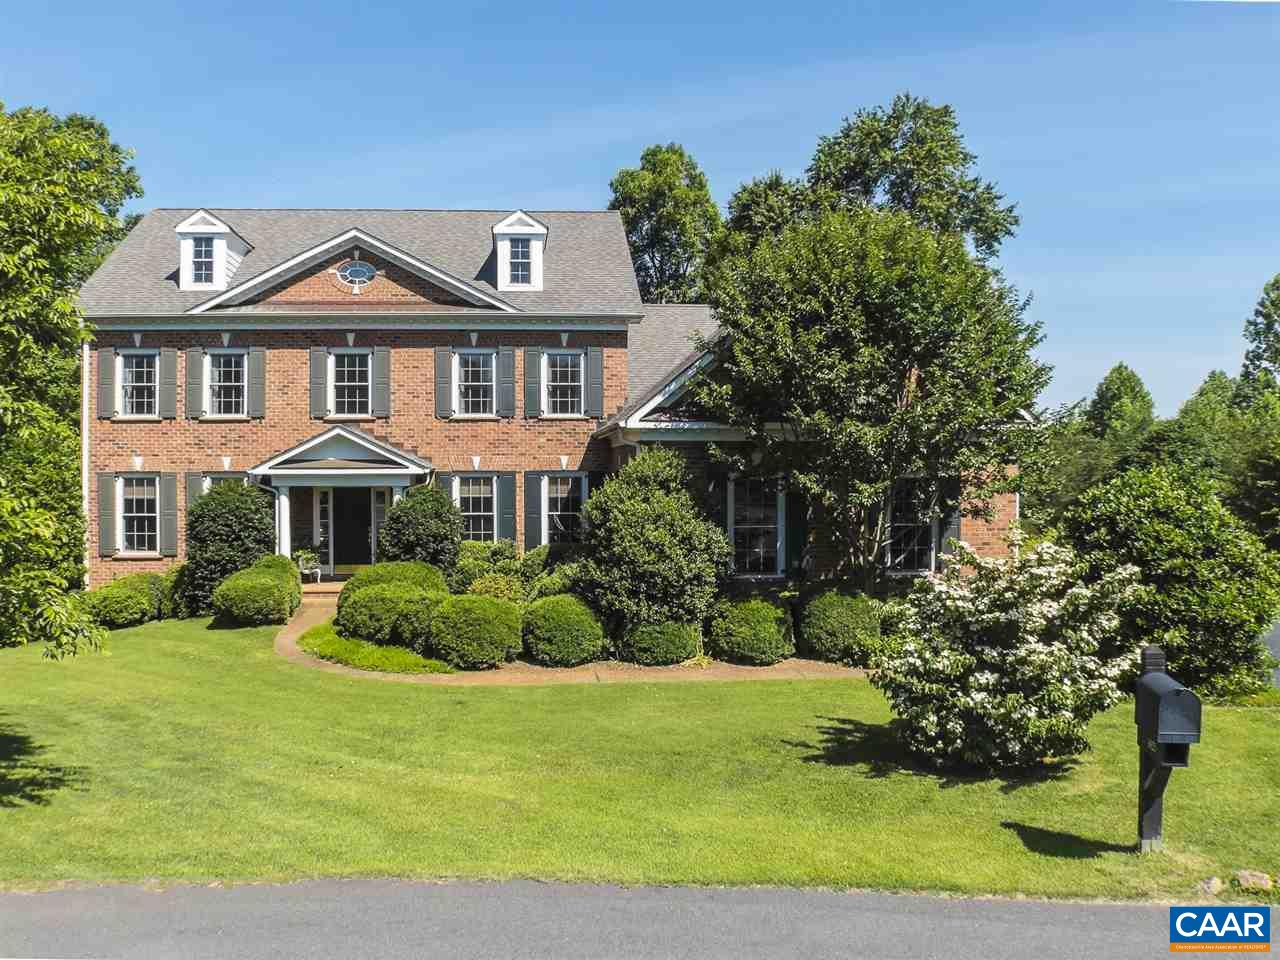 home for sale , MLS #555746, 3925 Creekwood Pl